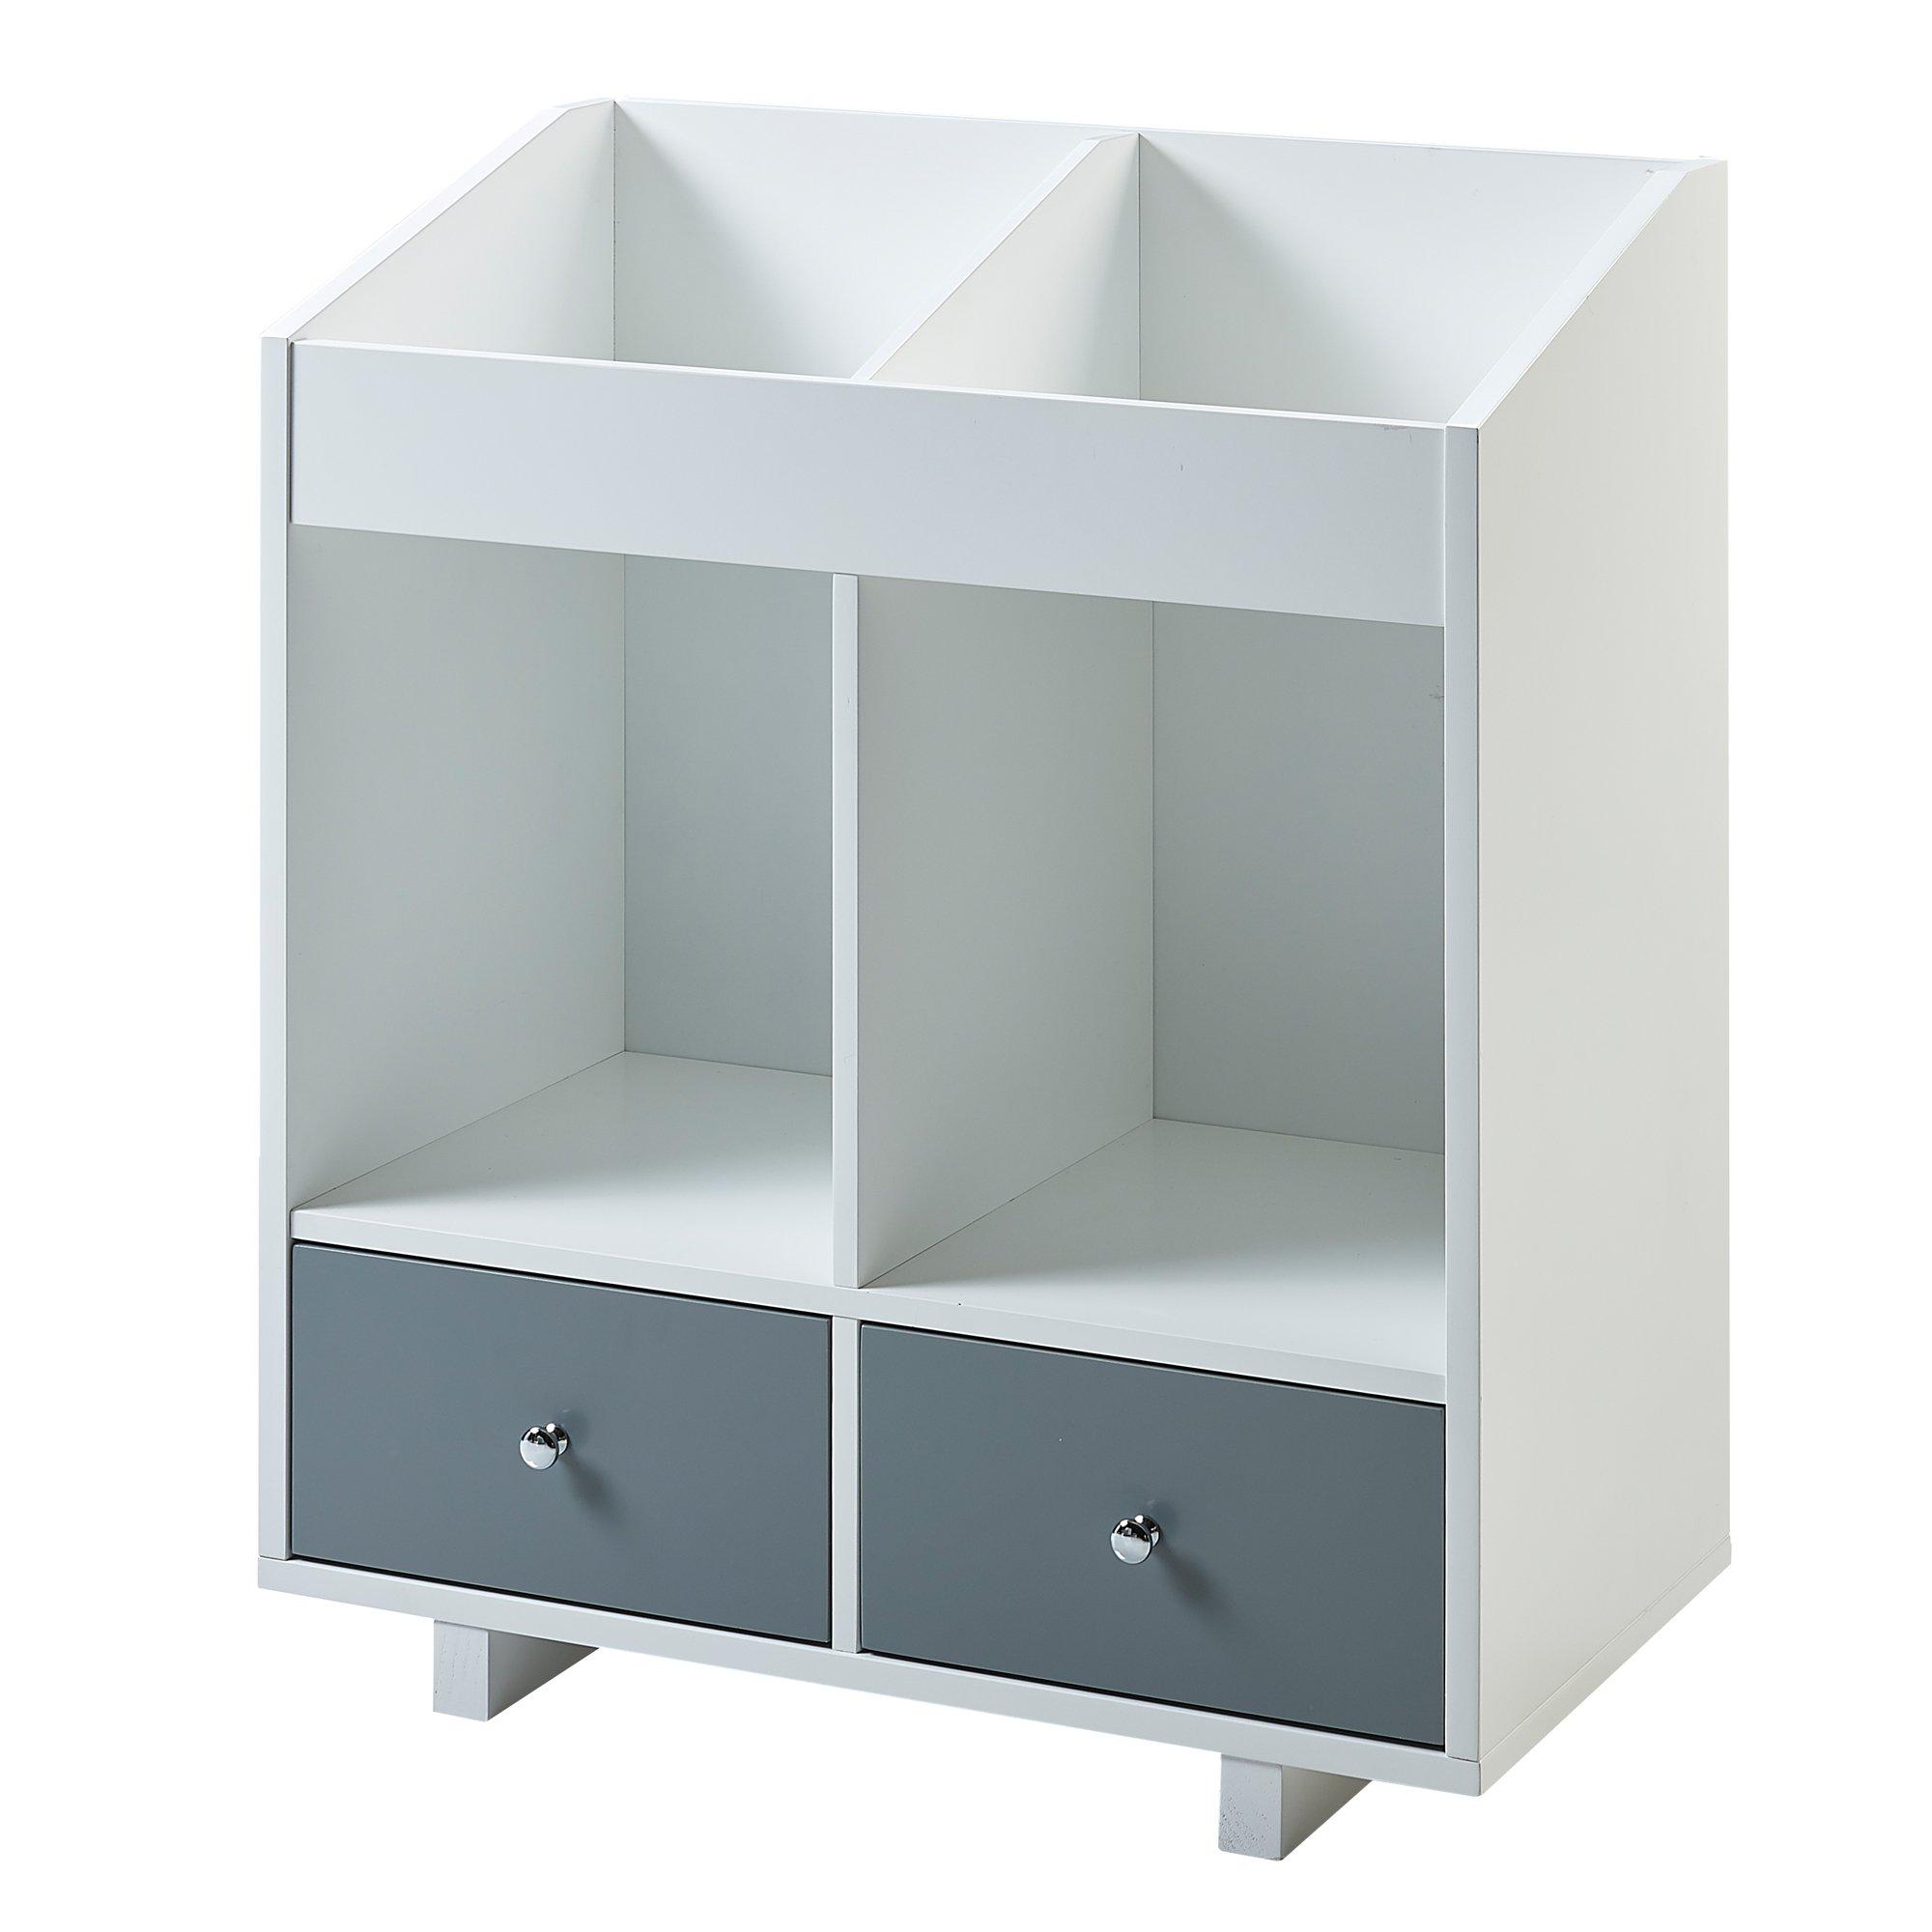 Versanora VNF-00010 Minimalista Space Saver Modern and Stylish 2 Section Storage Stand-White/Grey